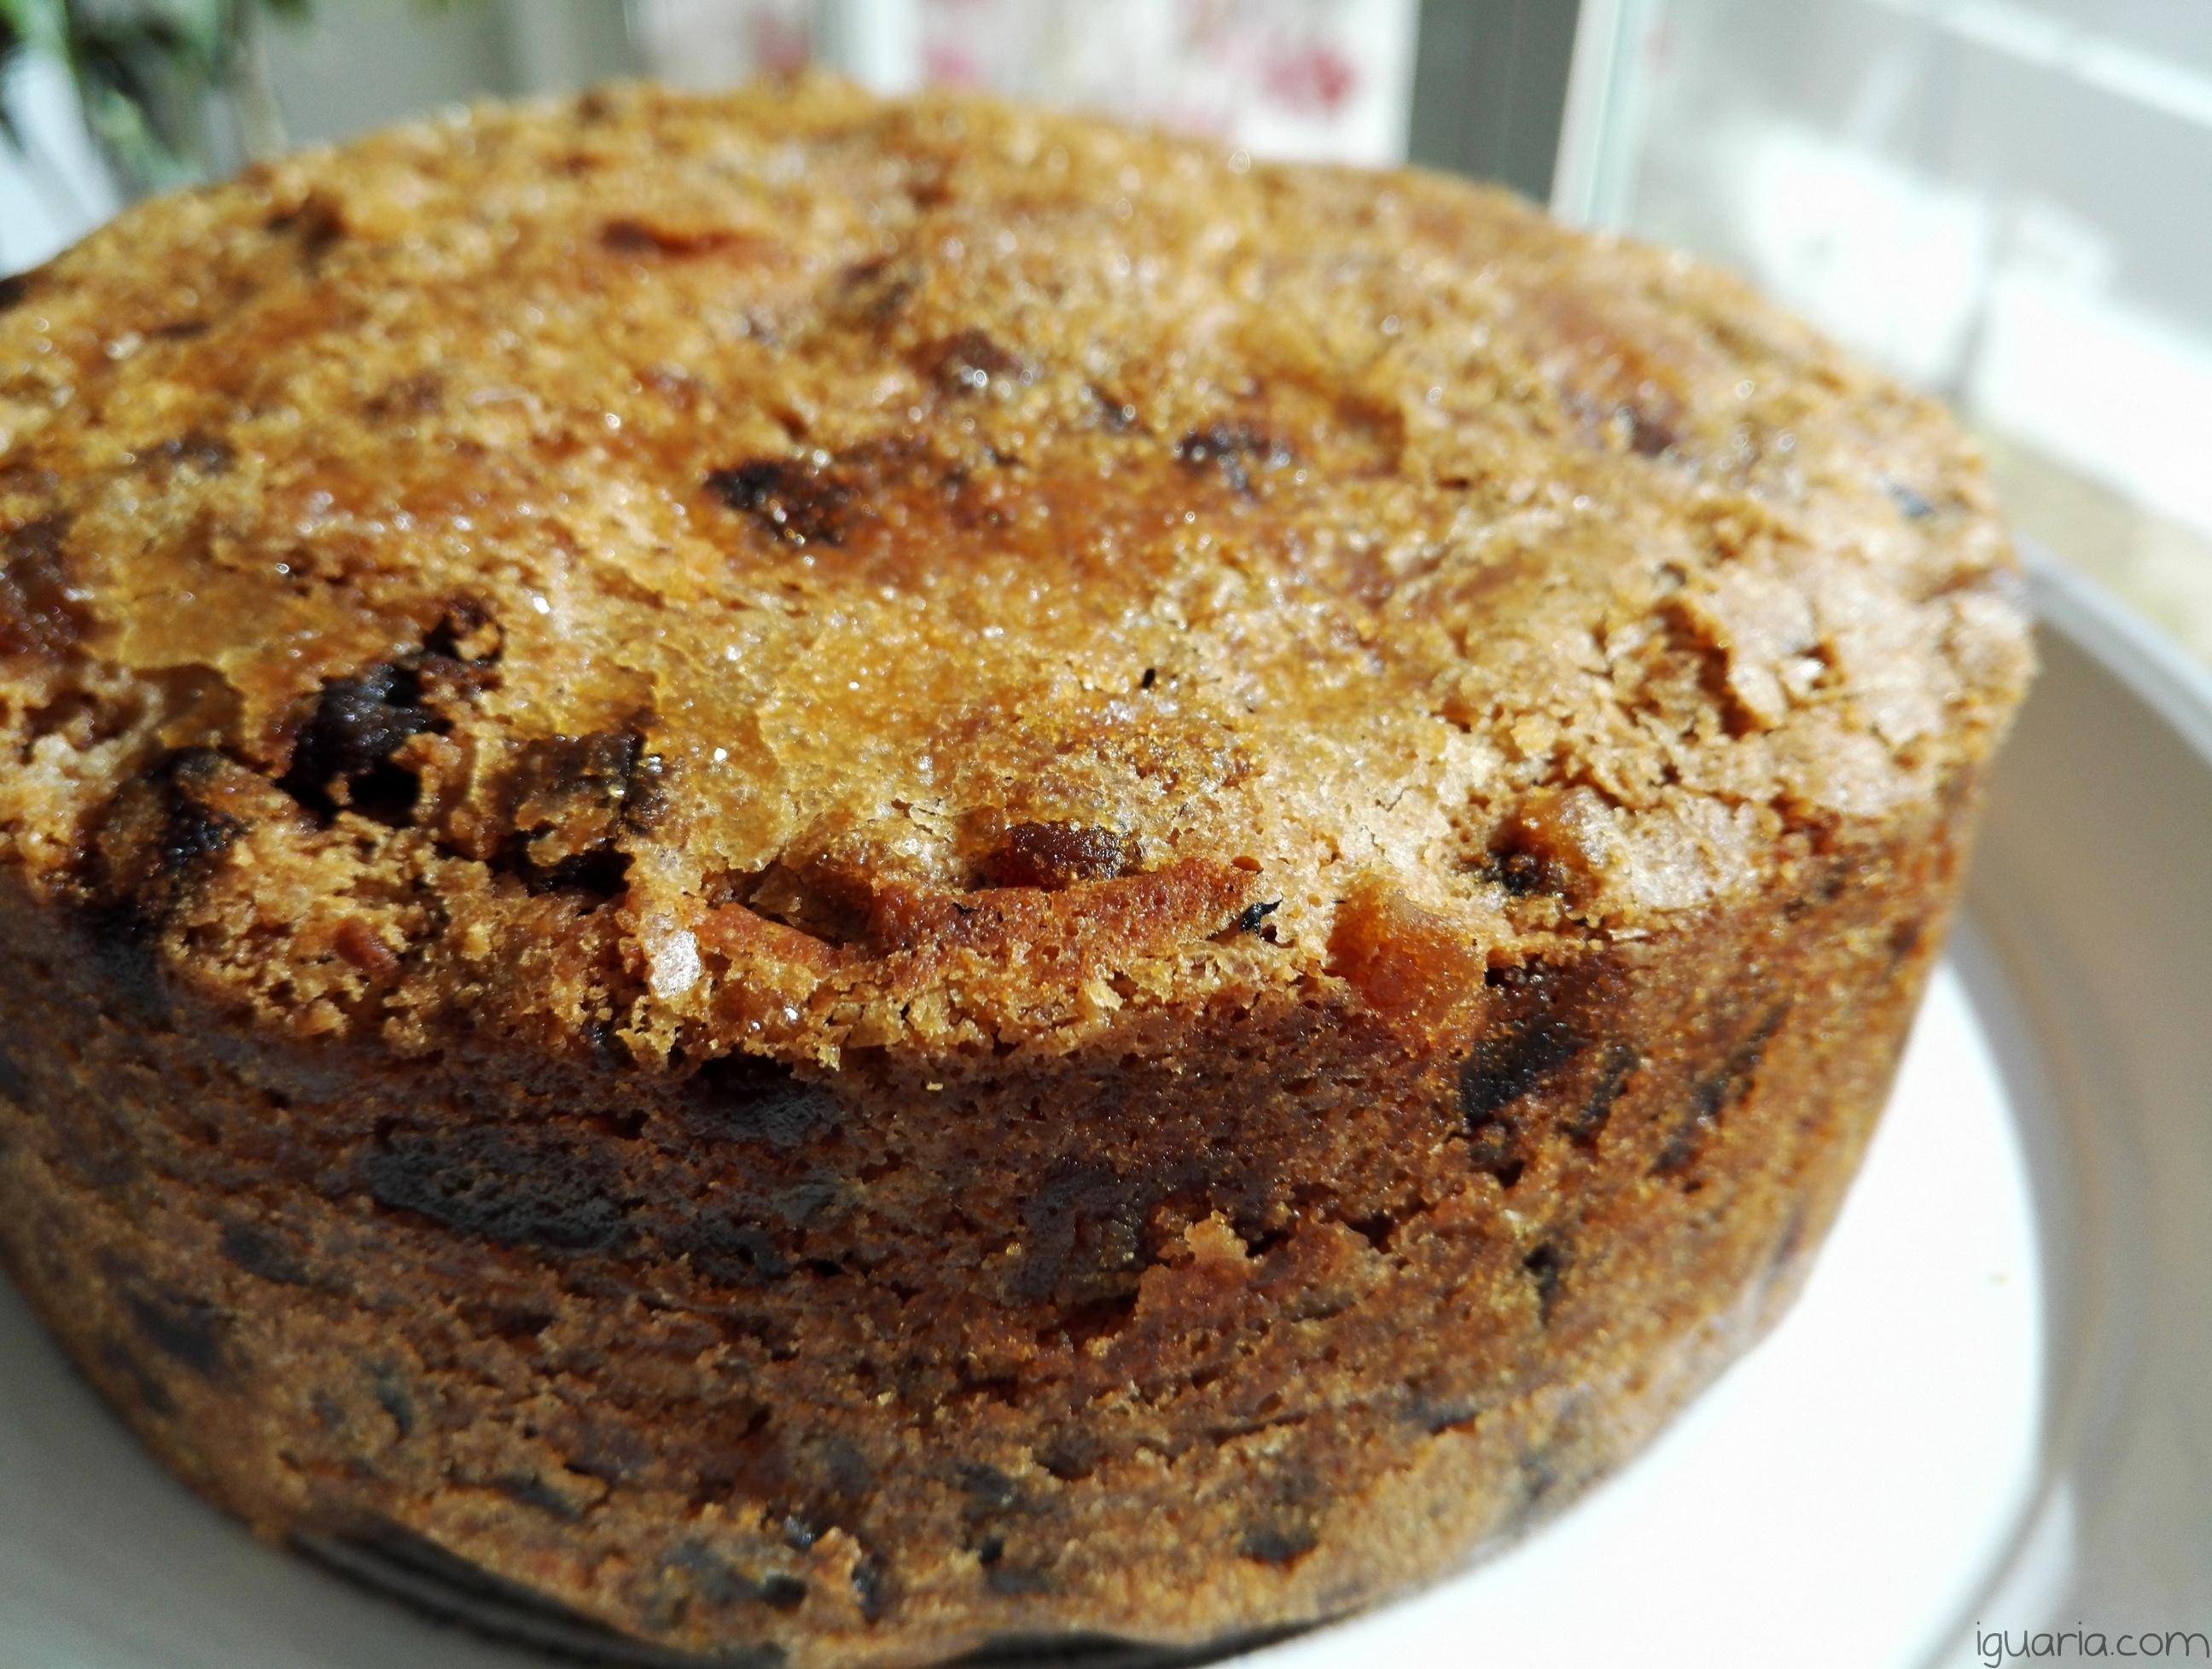 iguaria-bolo-de-frutos-secos-e-passas-ingles